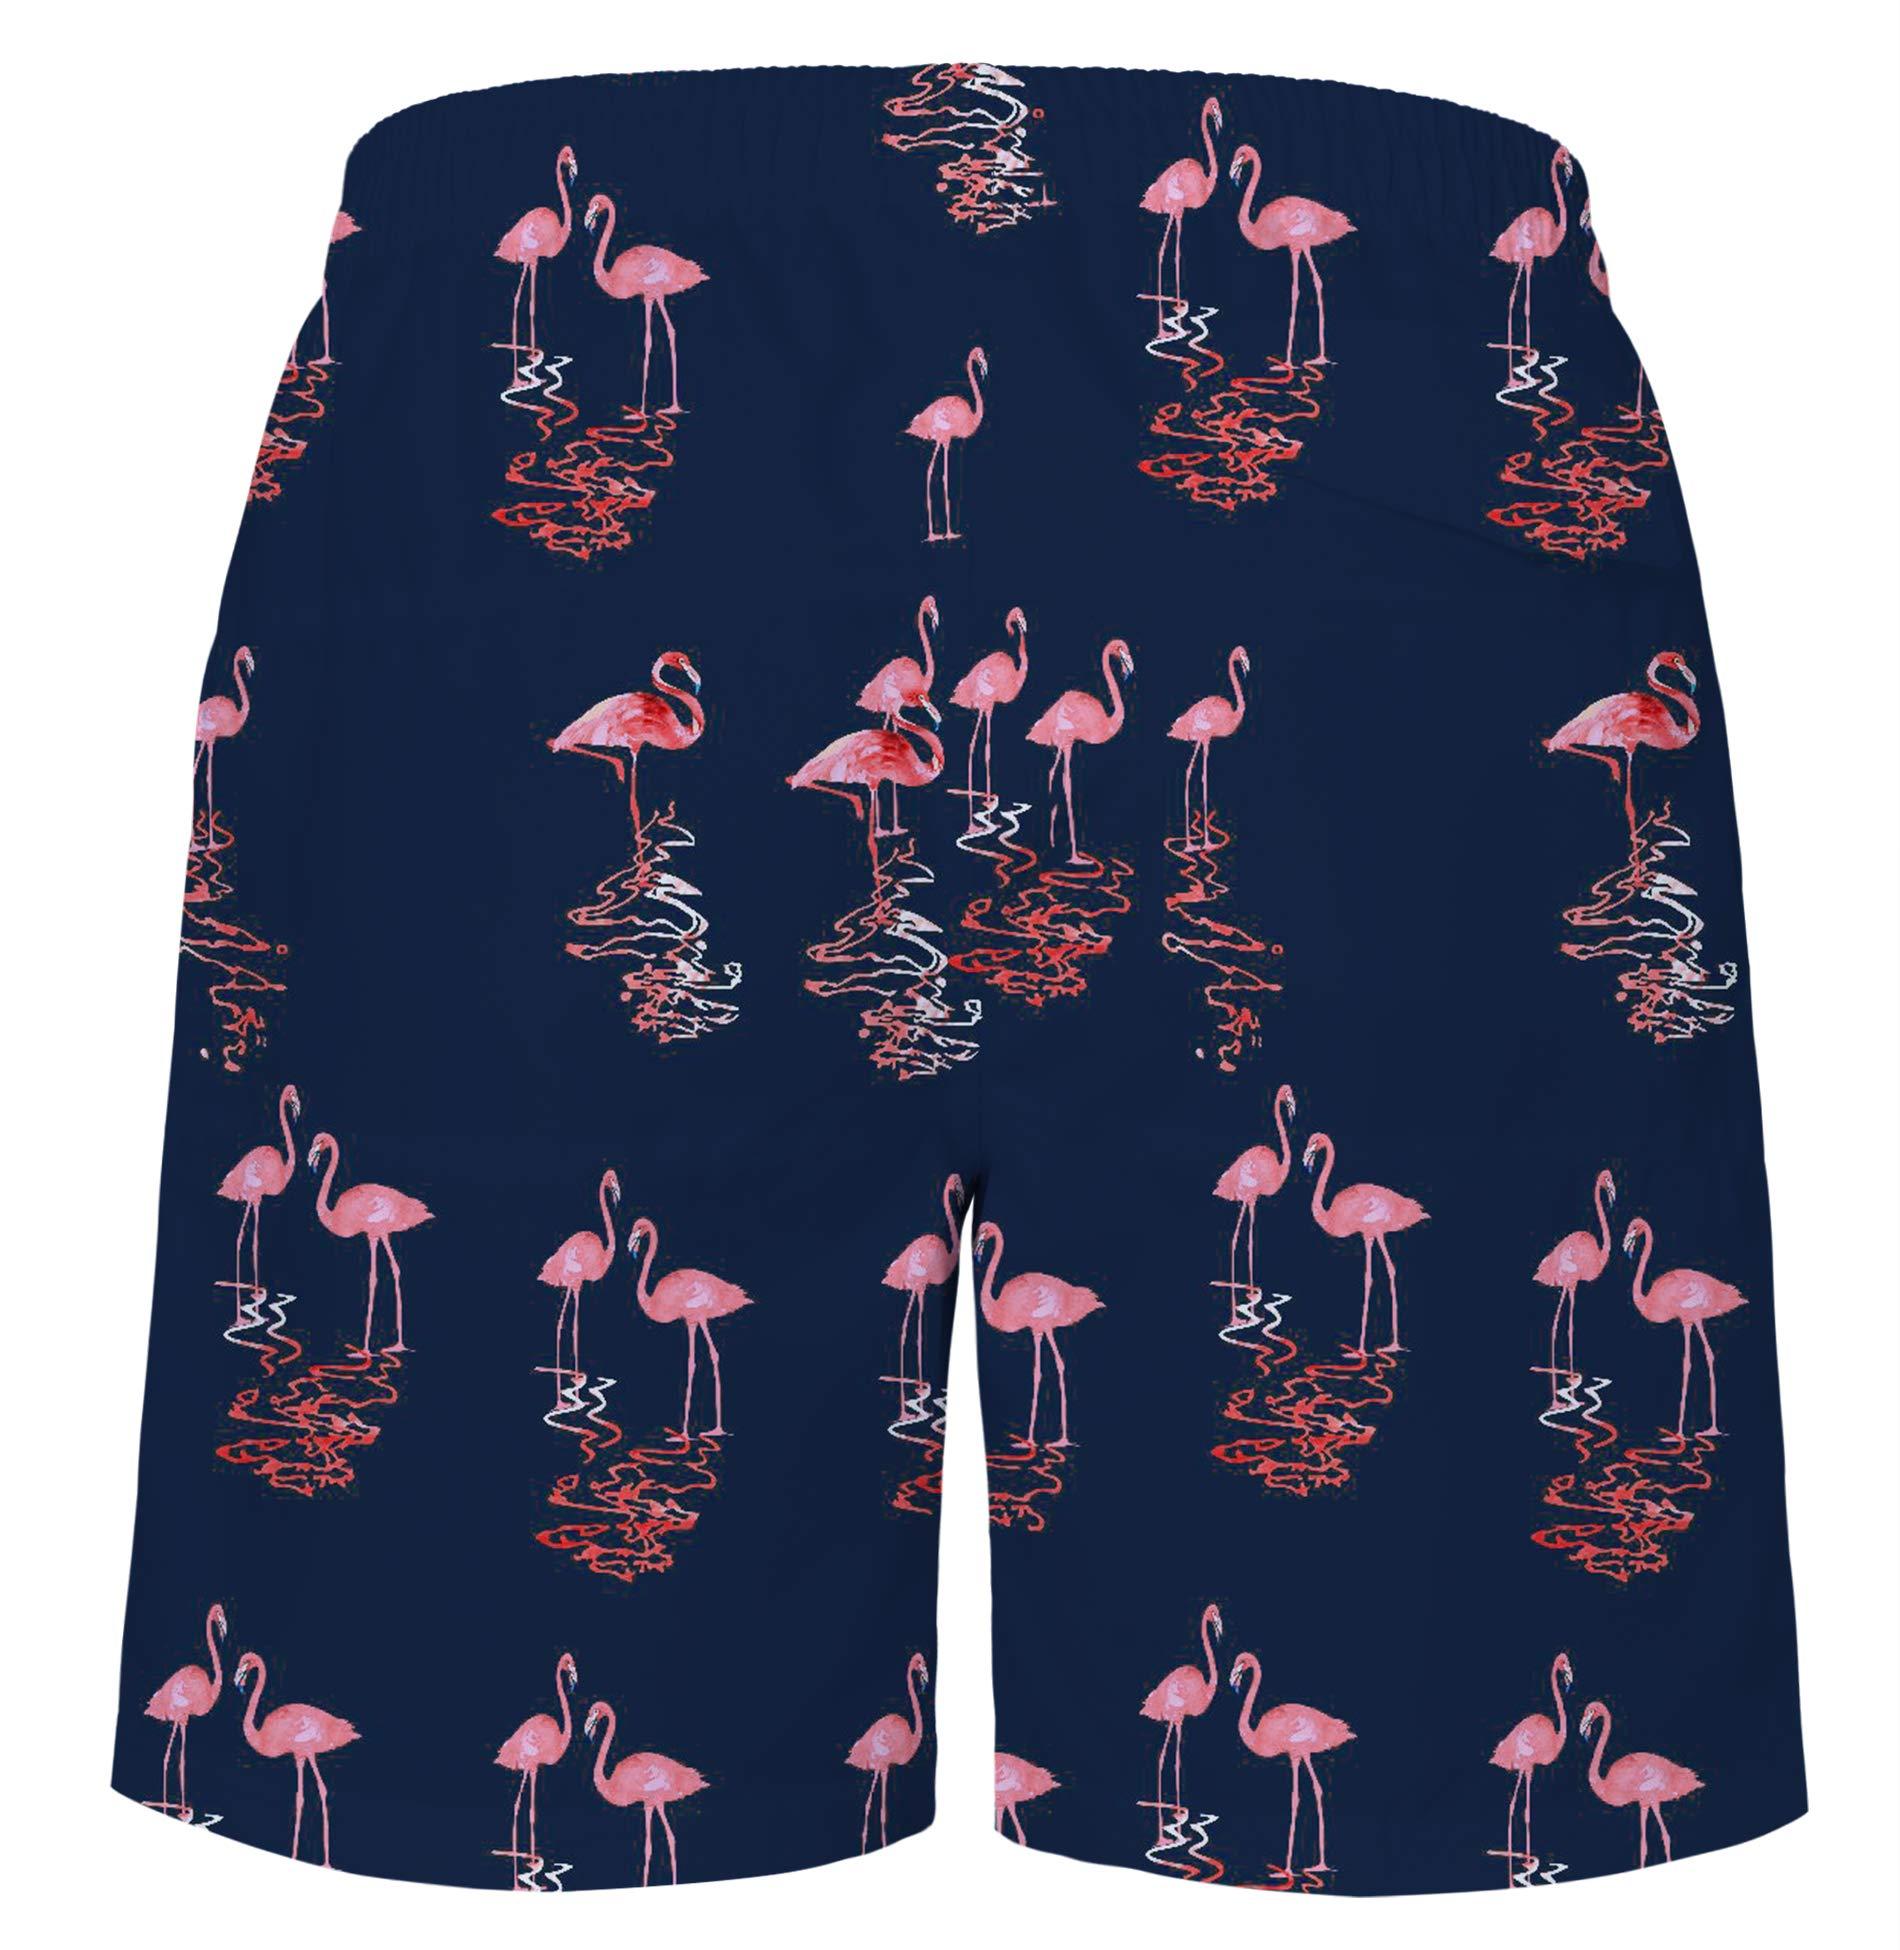 UNICOMIDEA Men\'s Beach Shorts Pink Flamingo Flowers Swim Trunks Slim Fit Quick Dry Sportwear Swim Shorts Elastic Waistband Swimtrunks